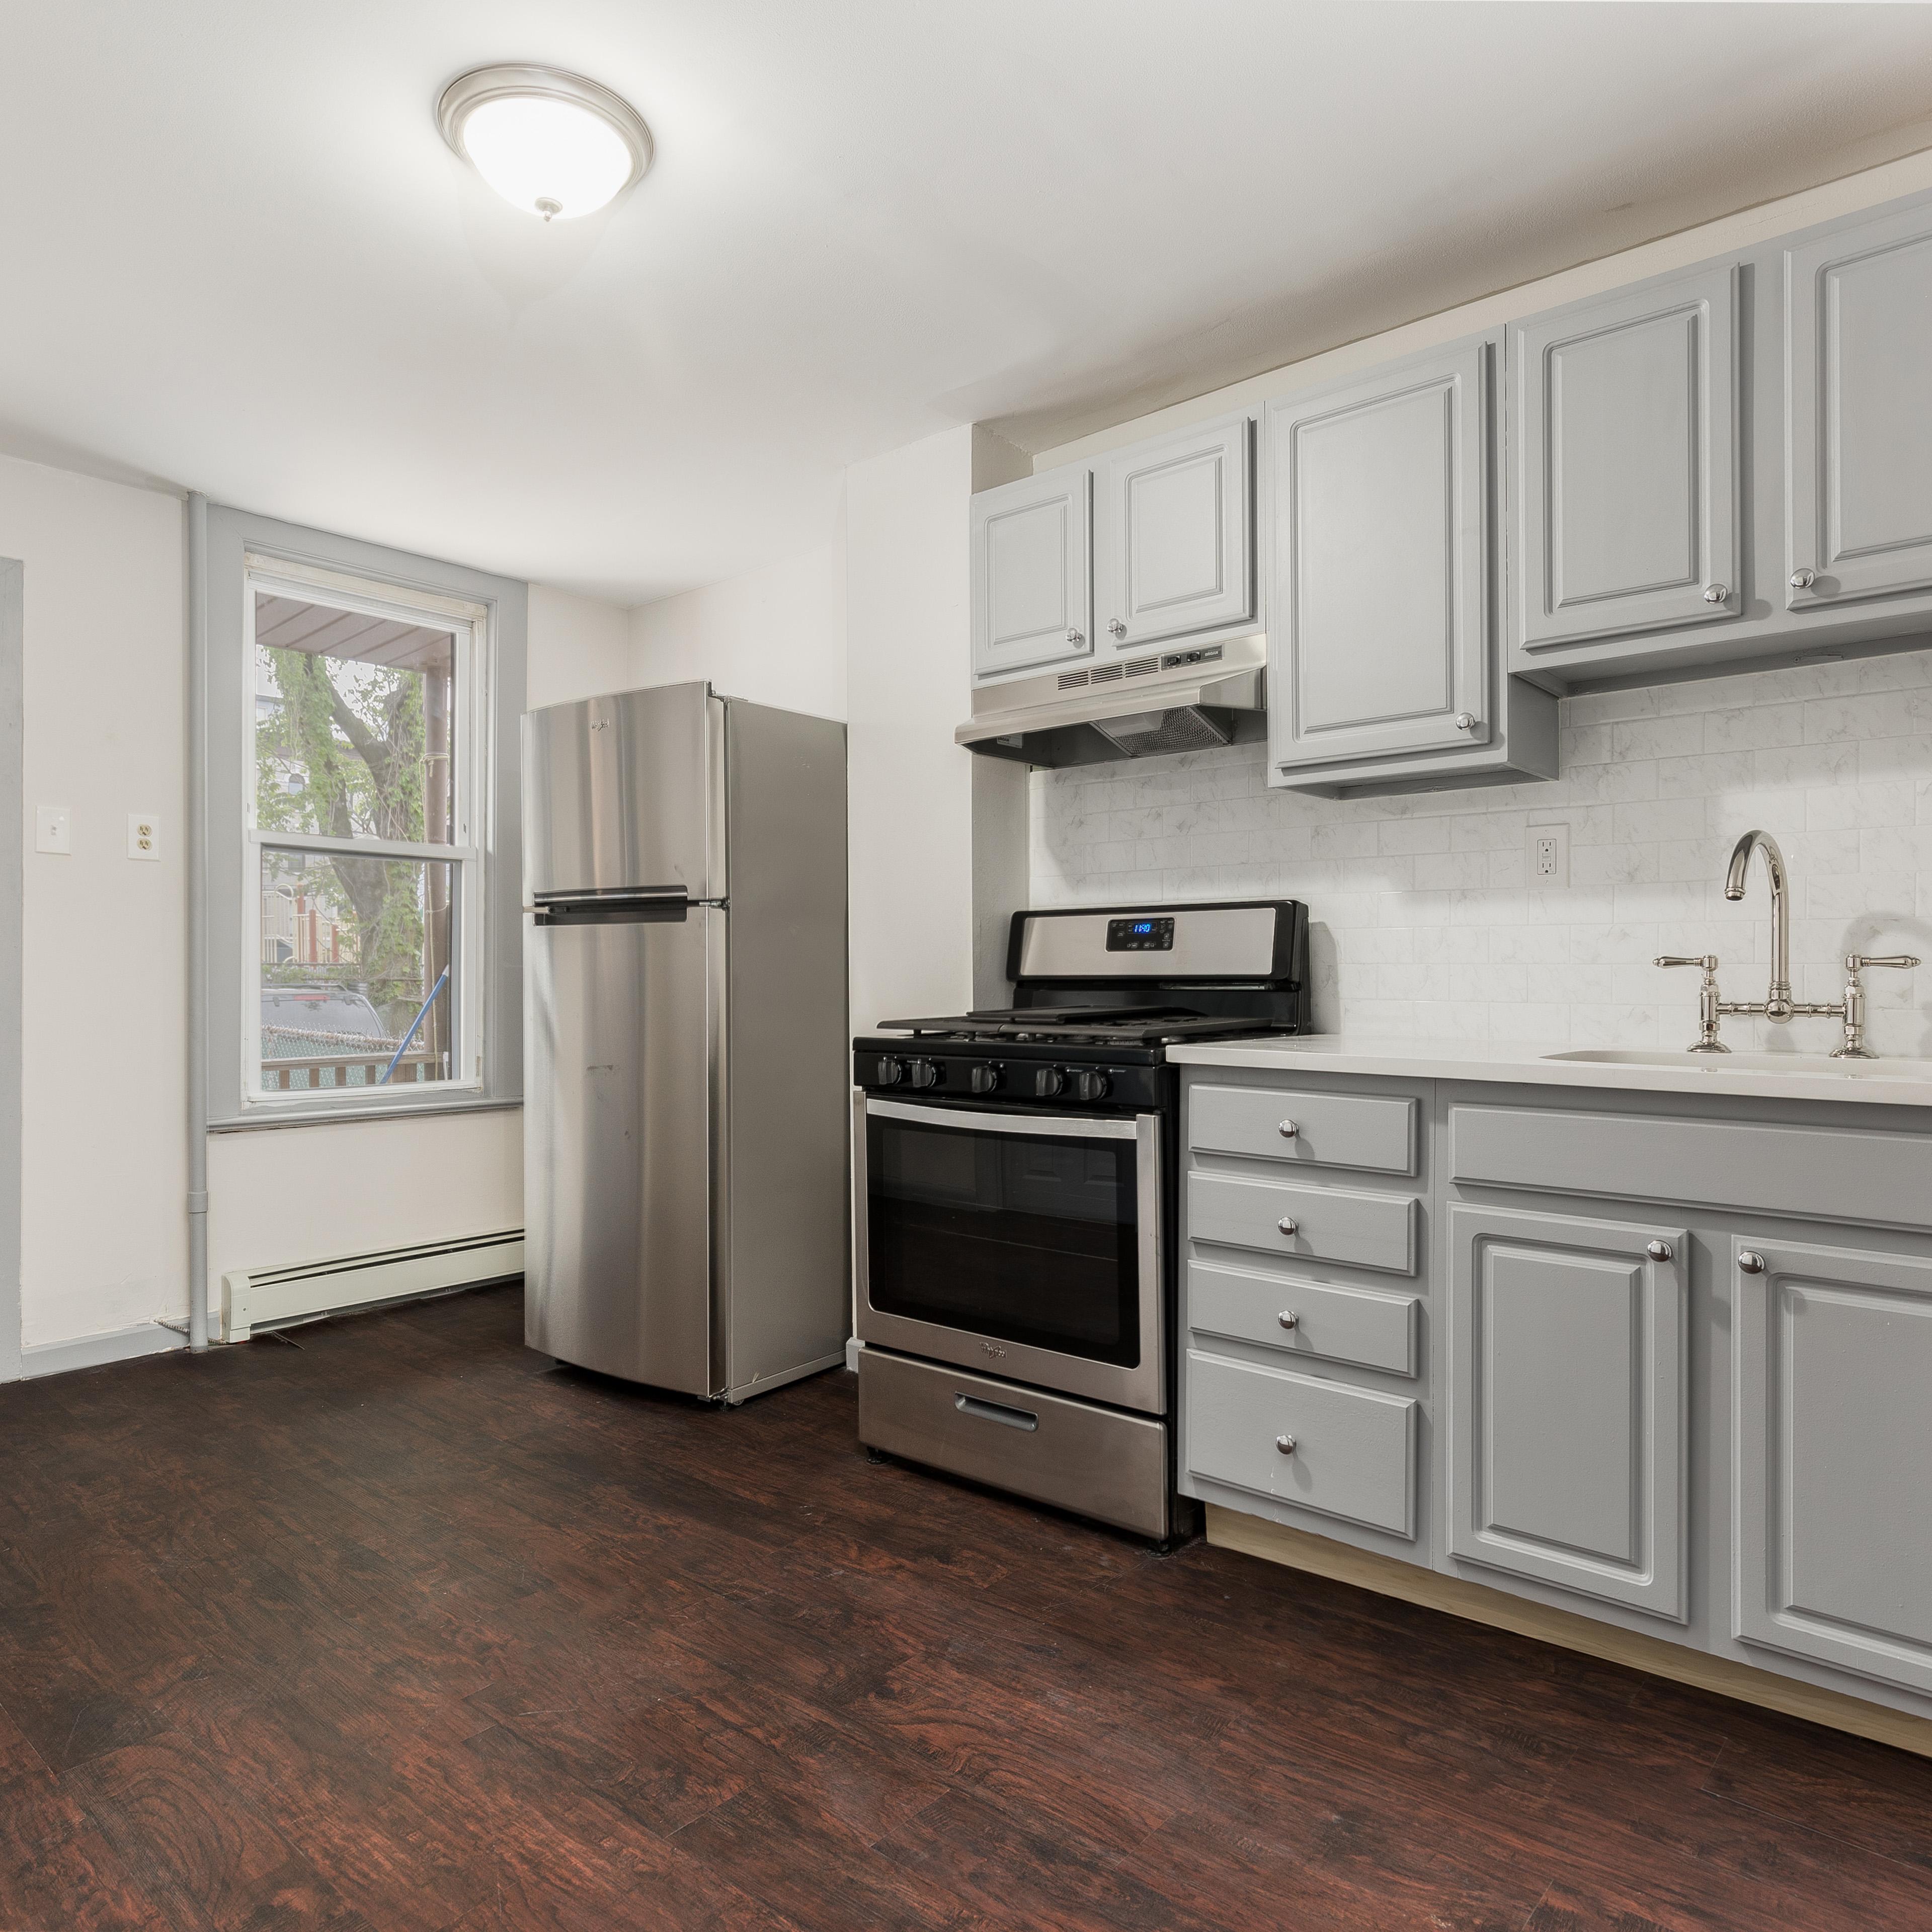 Image of property 96 W 21st St, U1